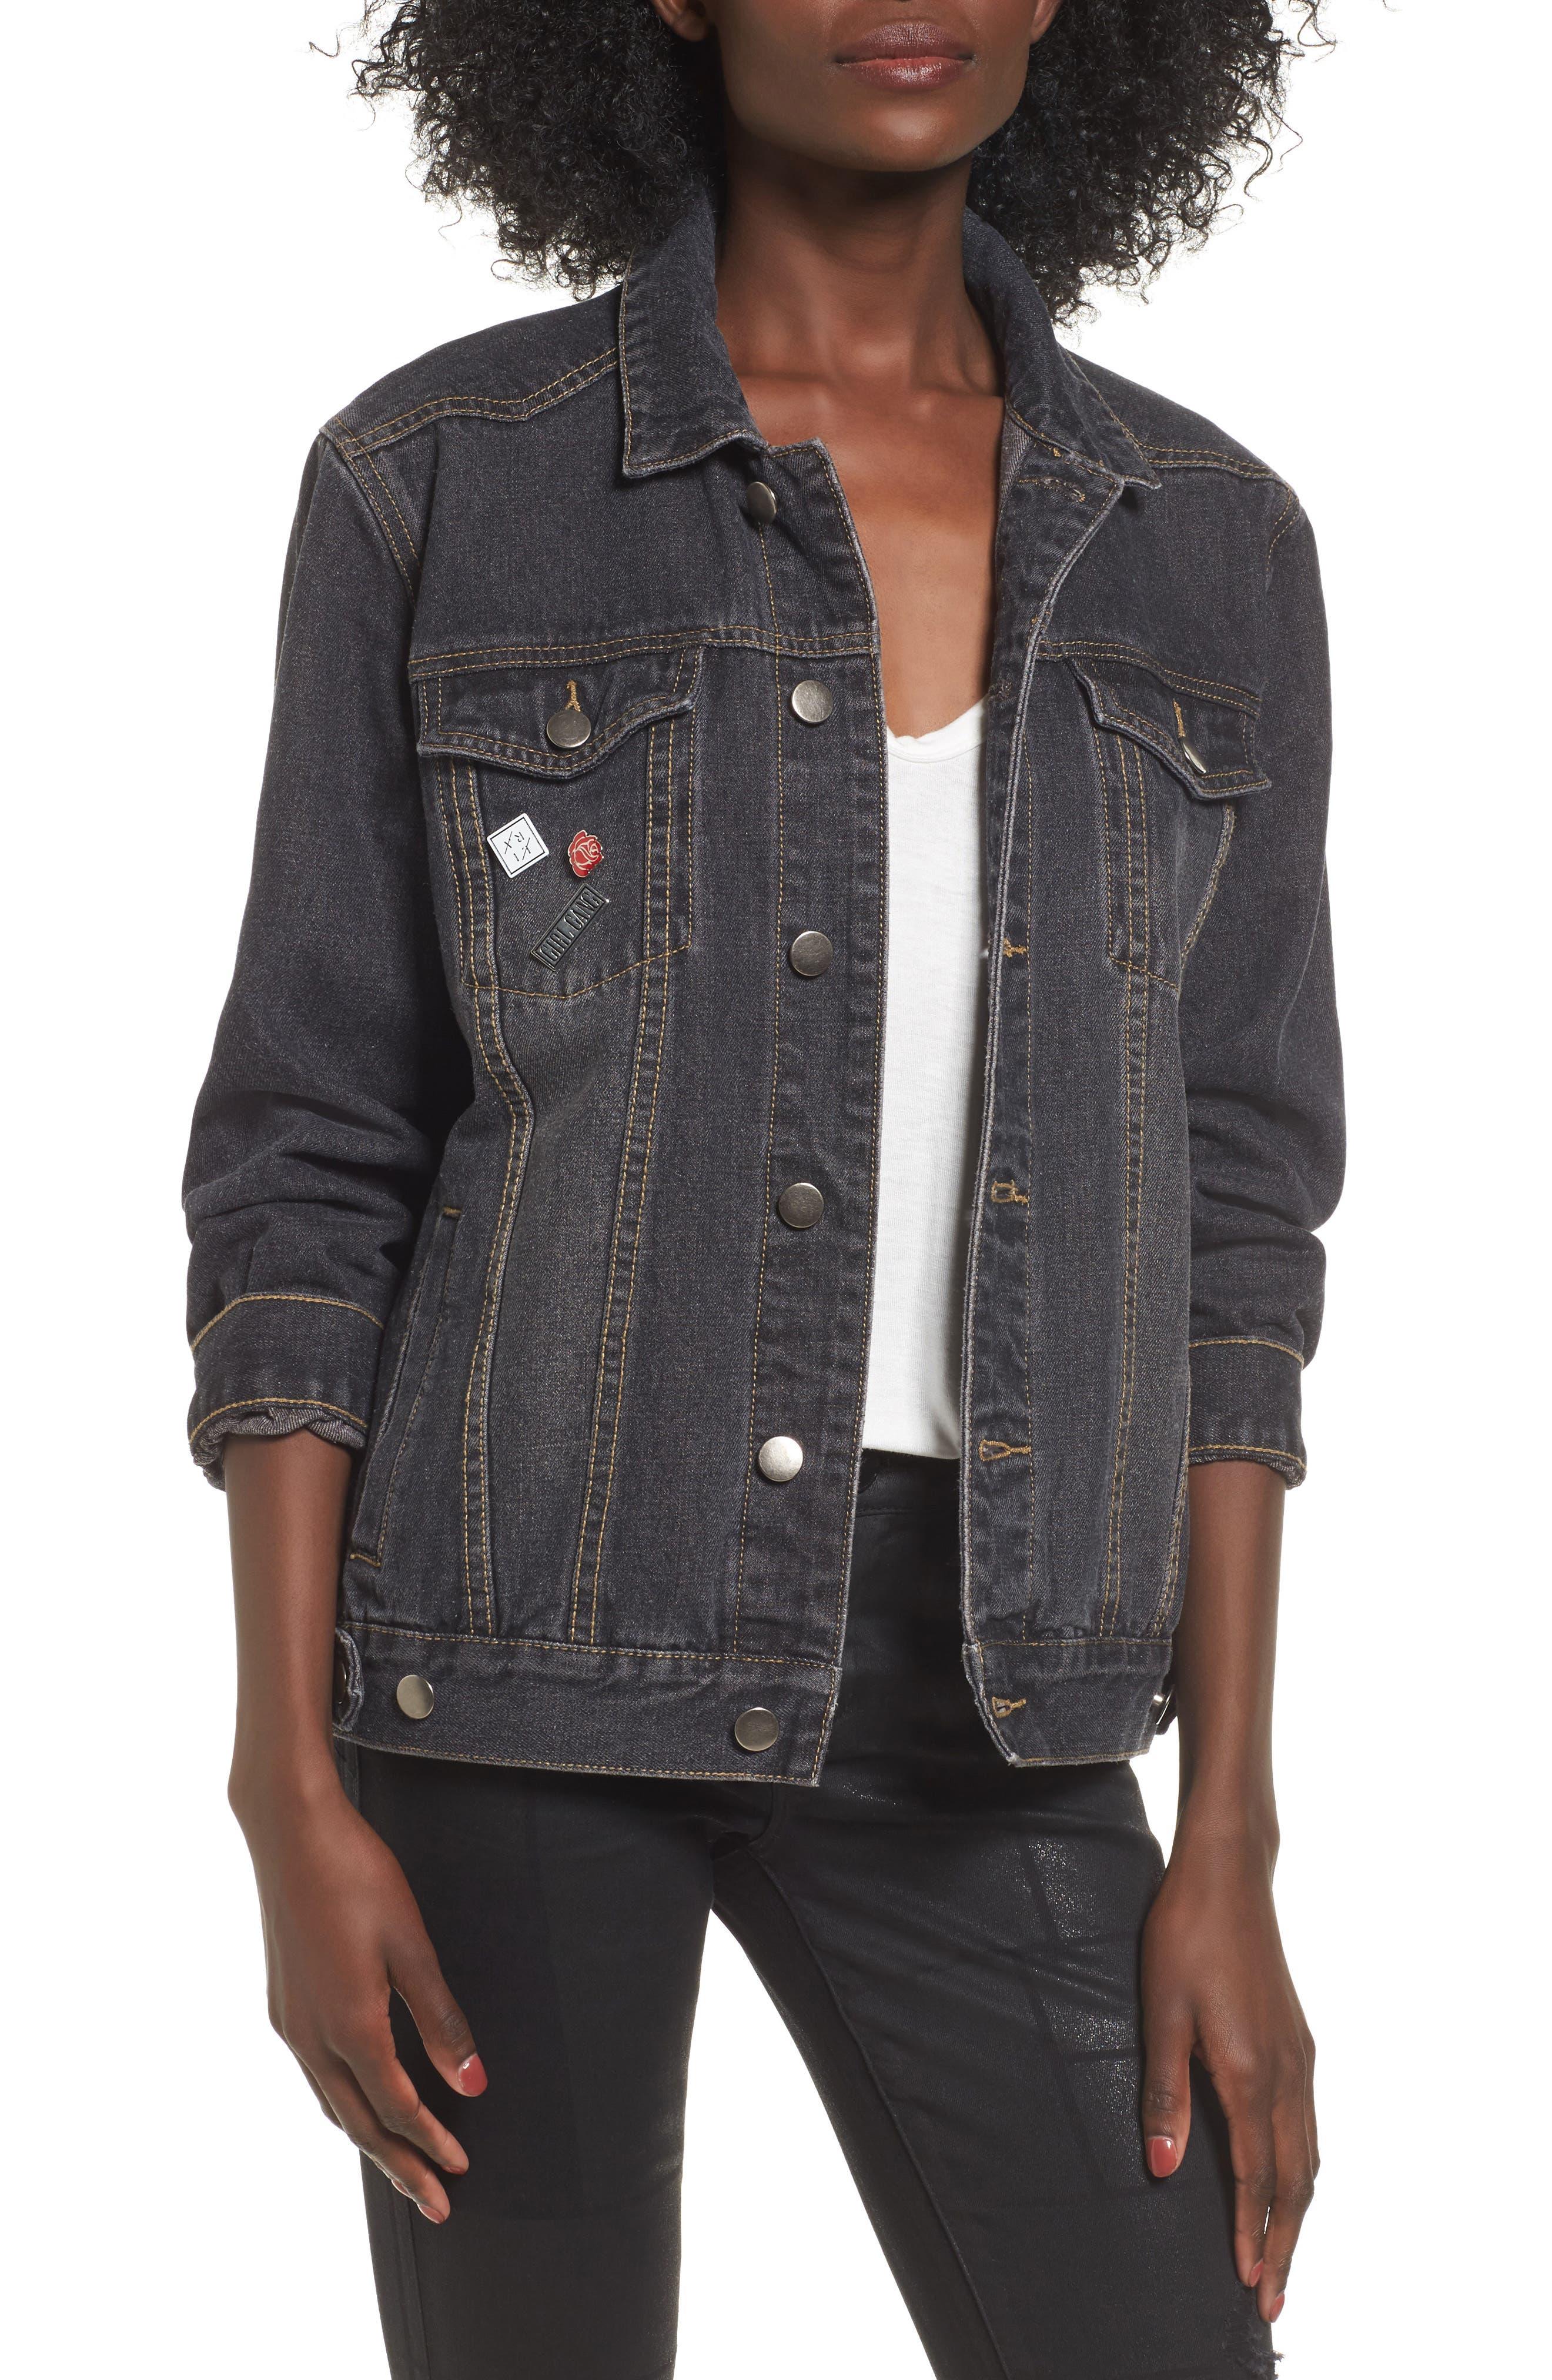 Lira Clothing Girl Gang Denim Jacket